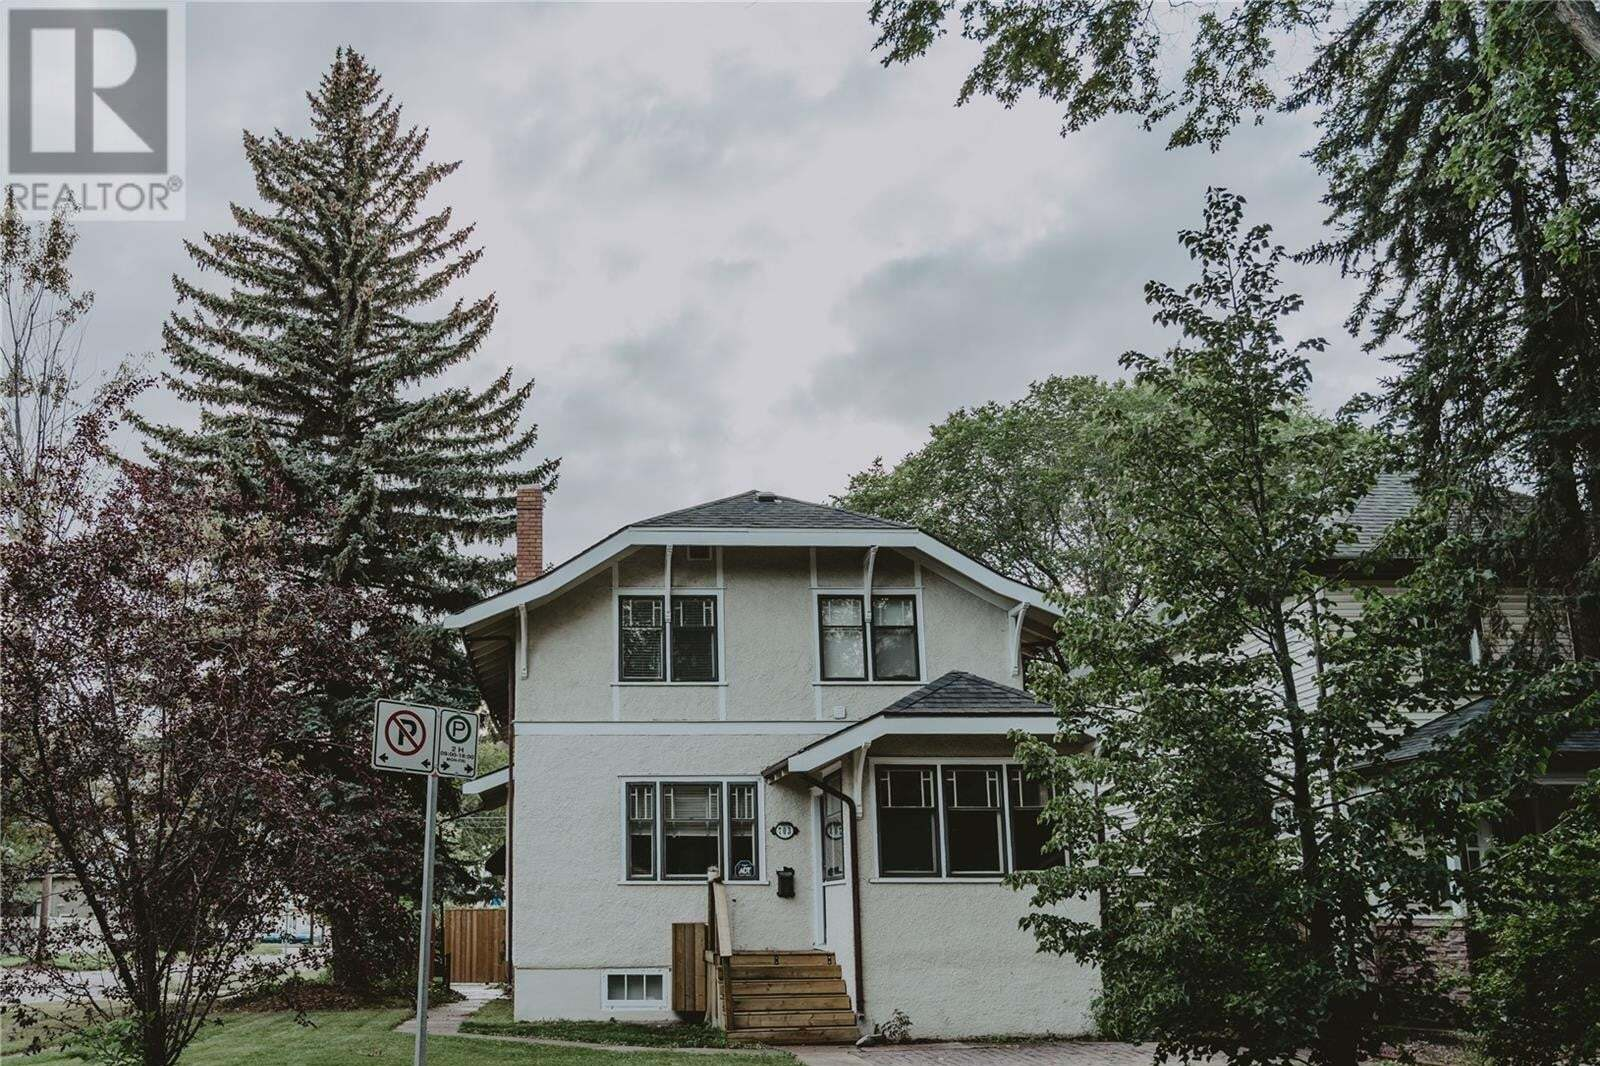 House for sale at 703 4th Ave N Saskatoon Saskatchewan - MLS: SK826683